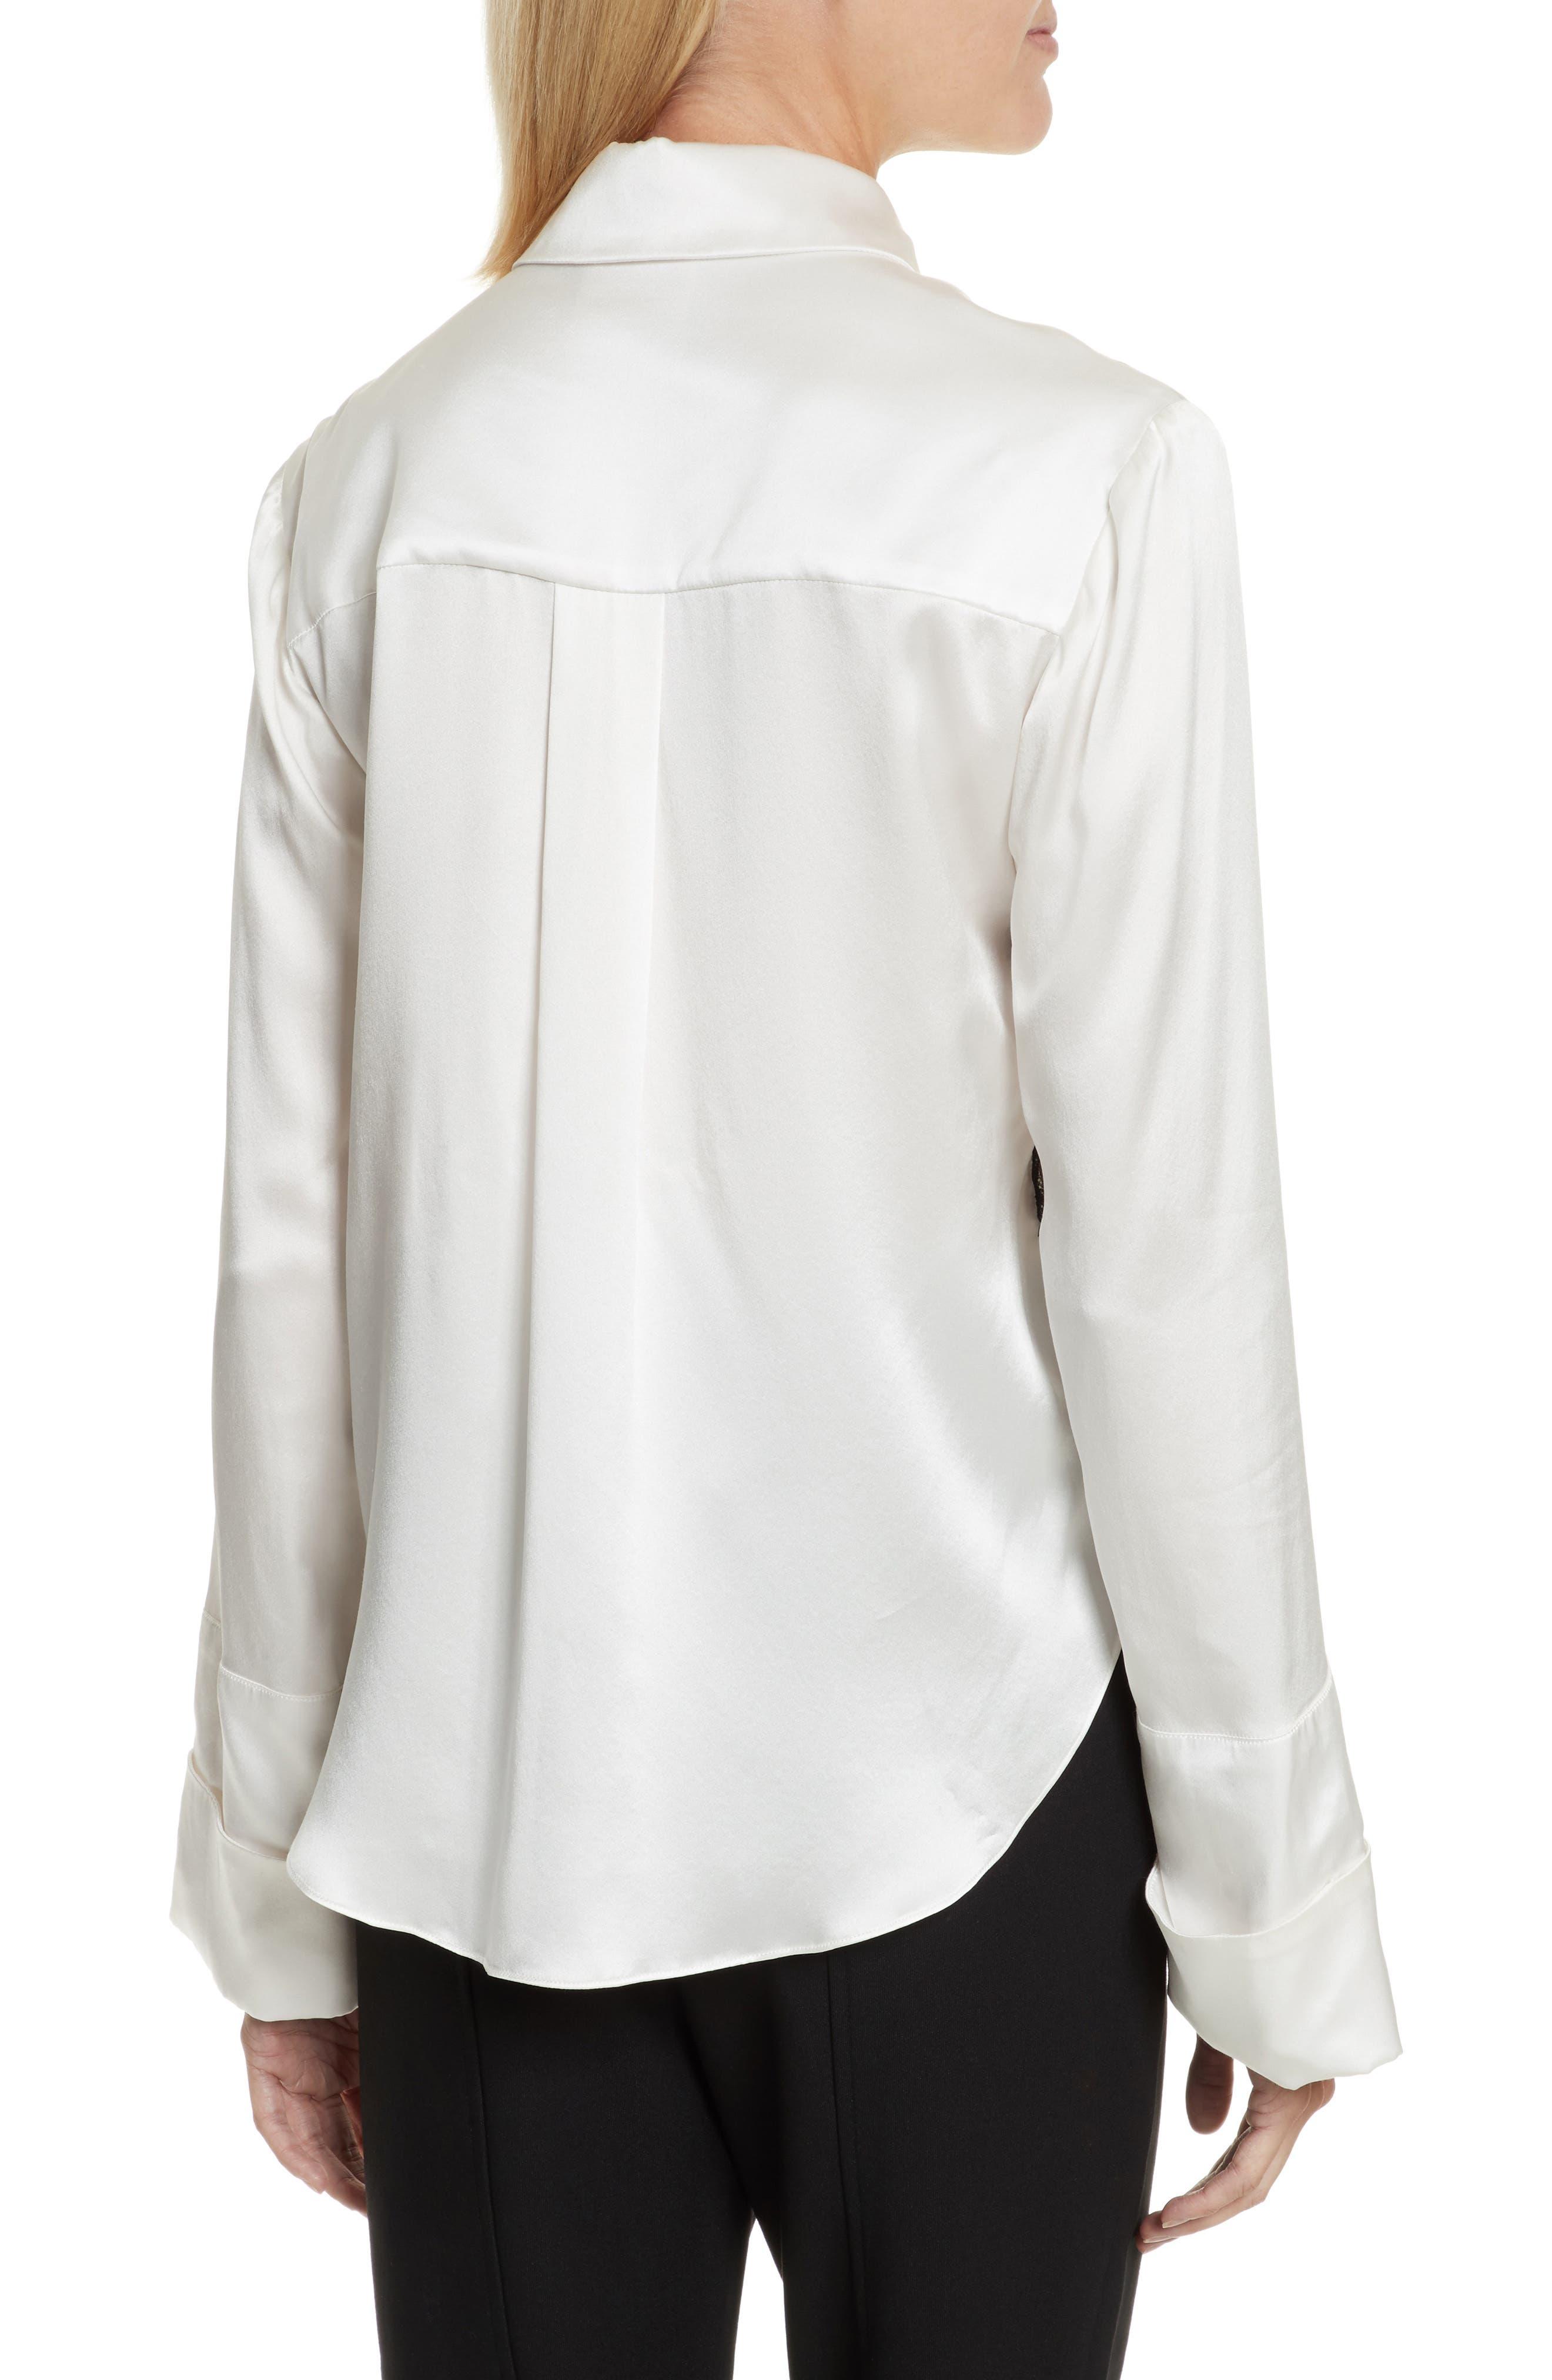 Korlan Lace Trim Silk Top,                             Alternate thumbnail 2, color,                             Ivory/ Black